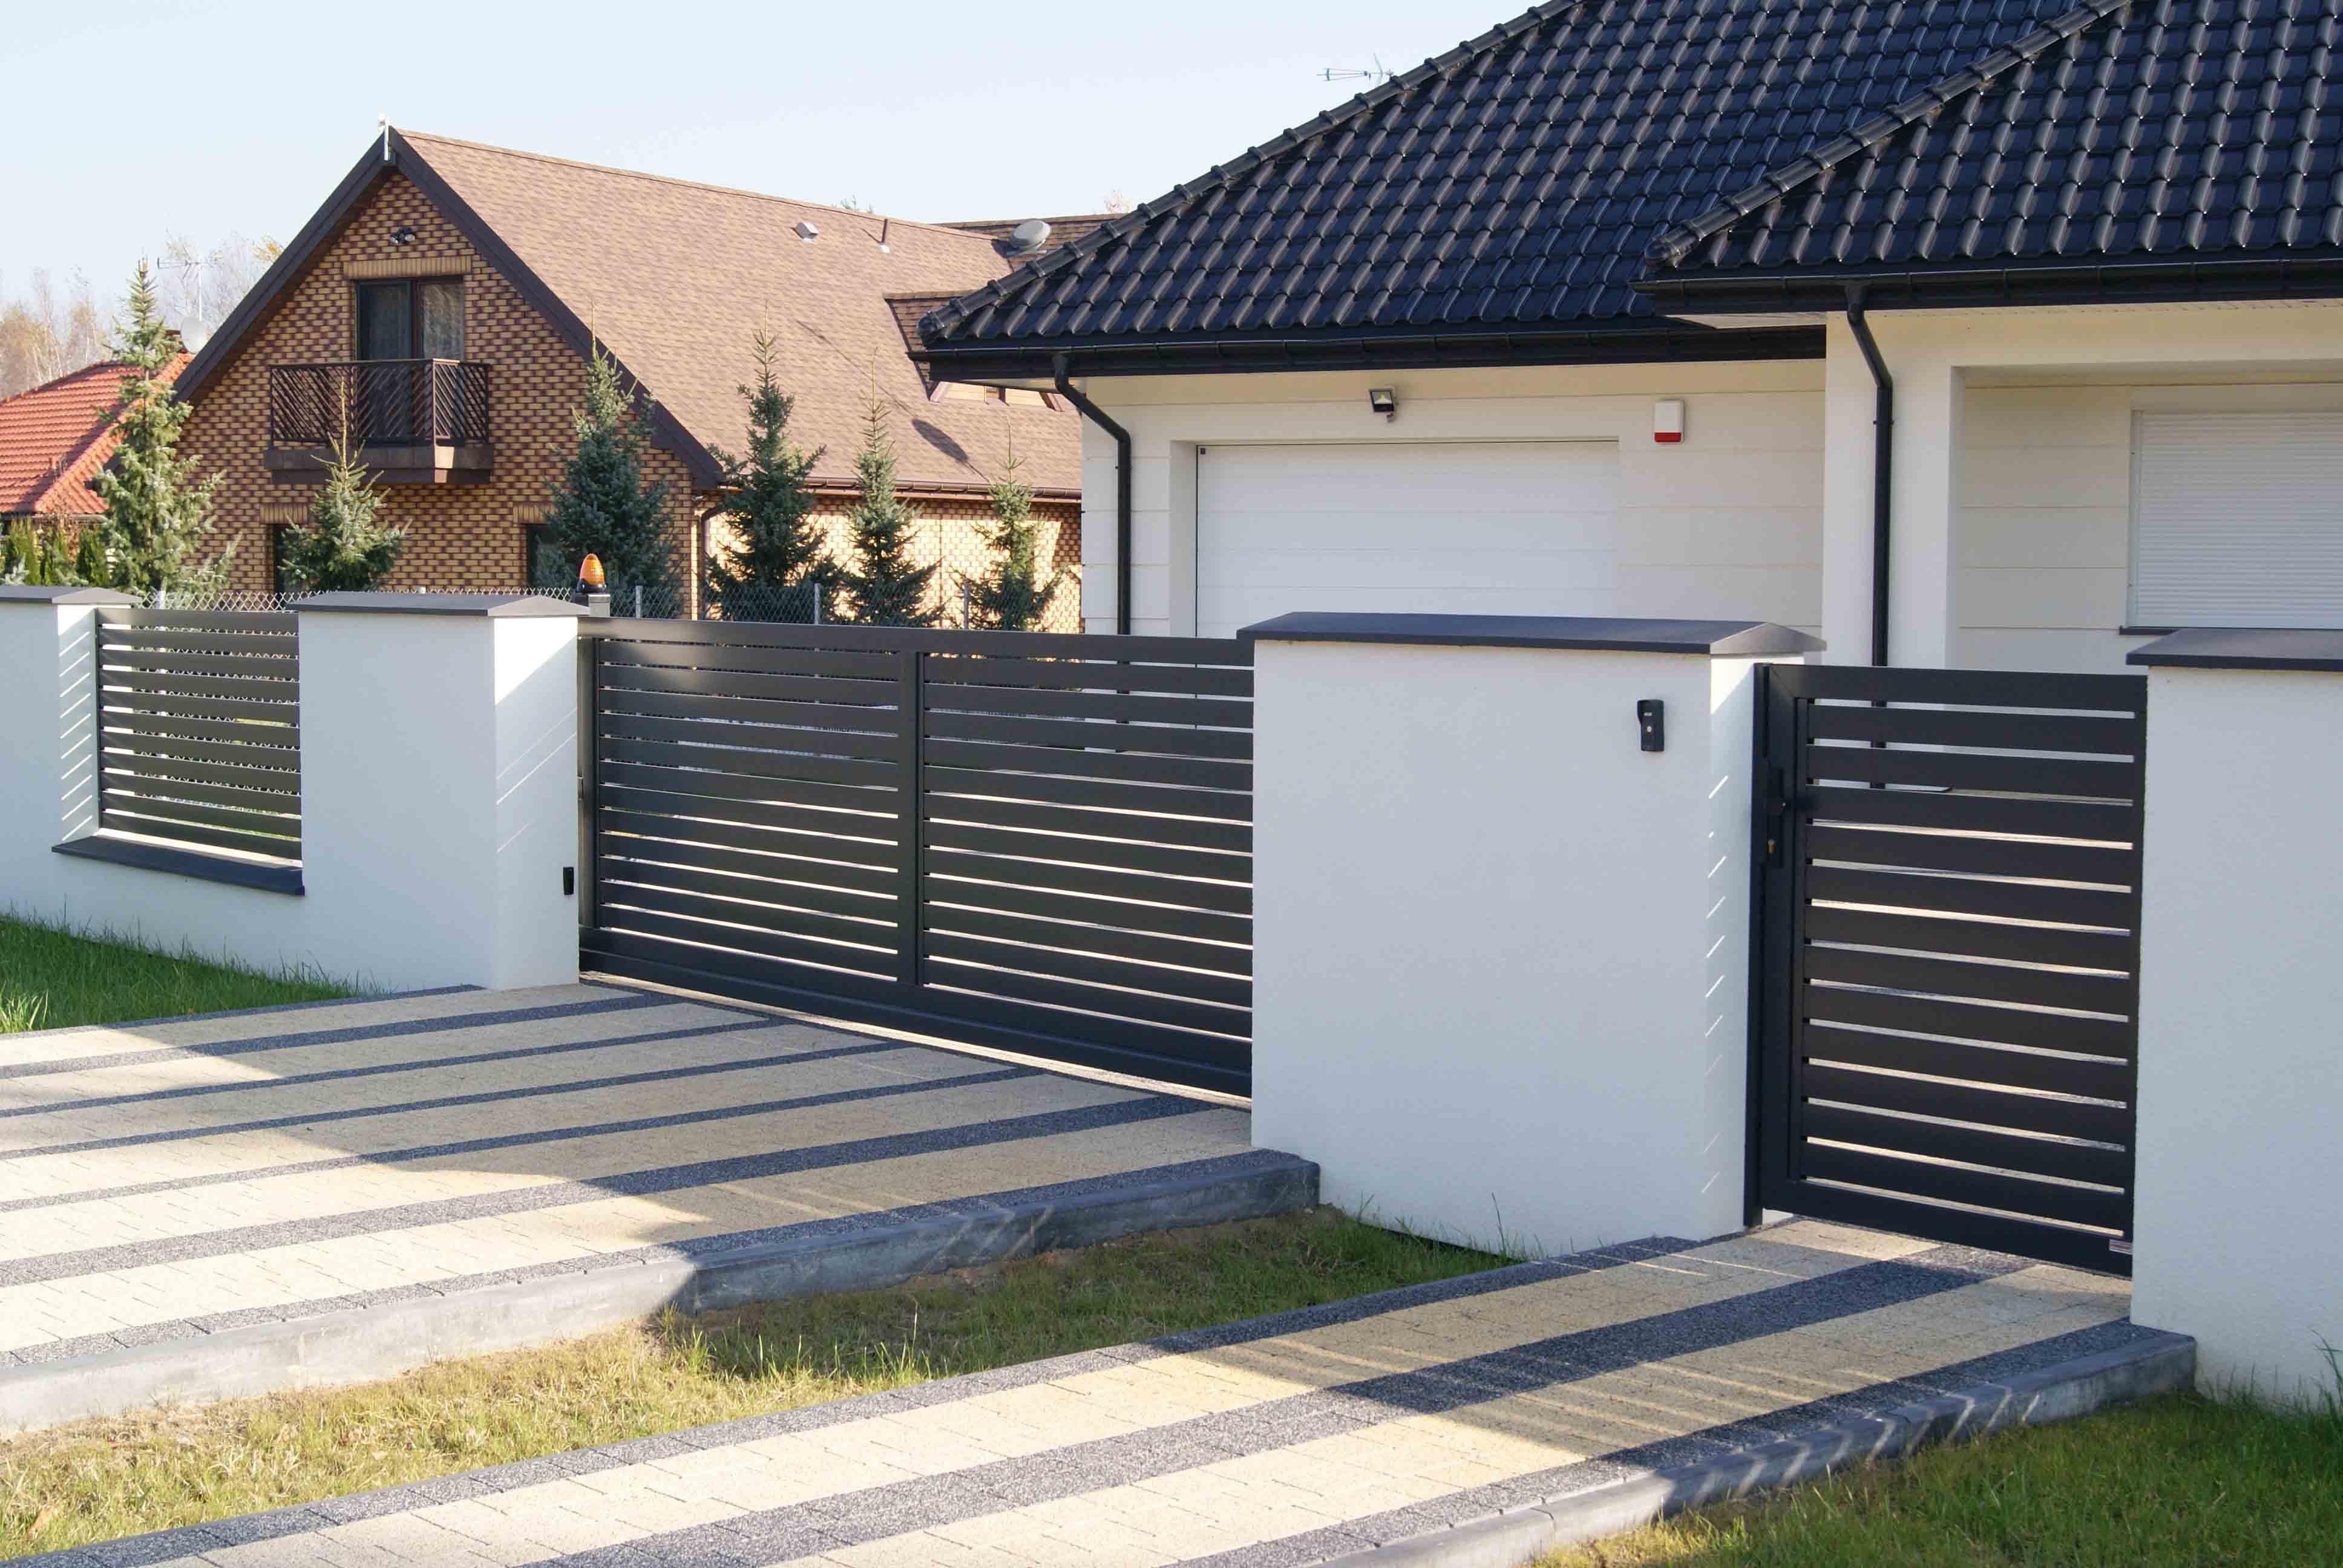 ogrodzenie palisadowe PP002(P82) BORDER KONSPORT